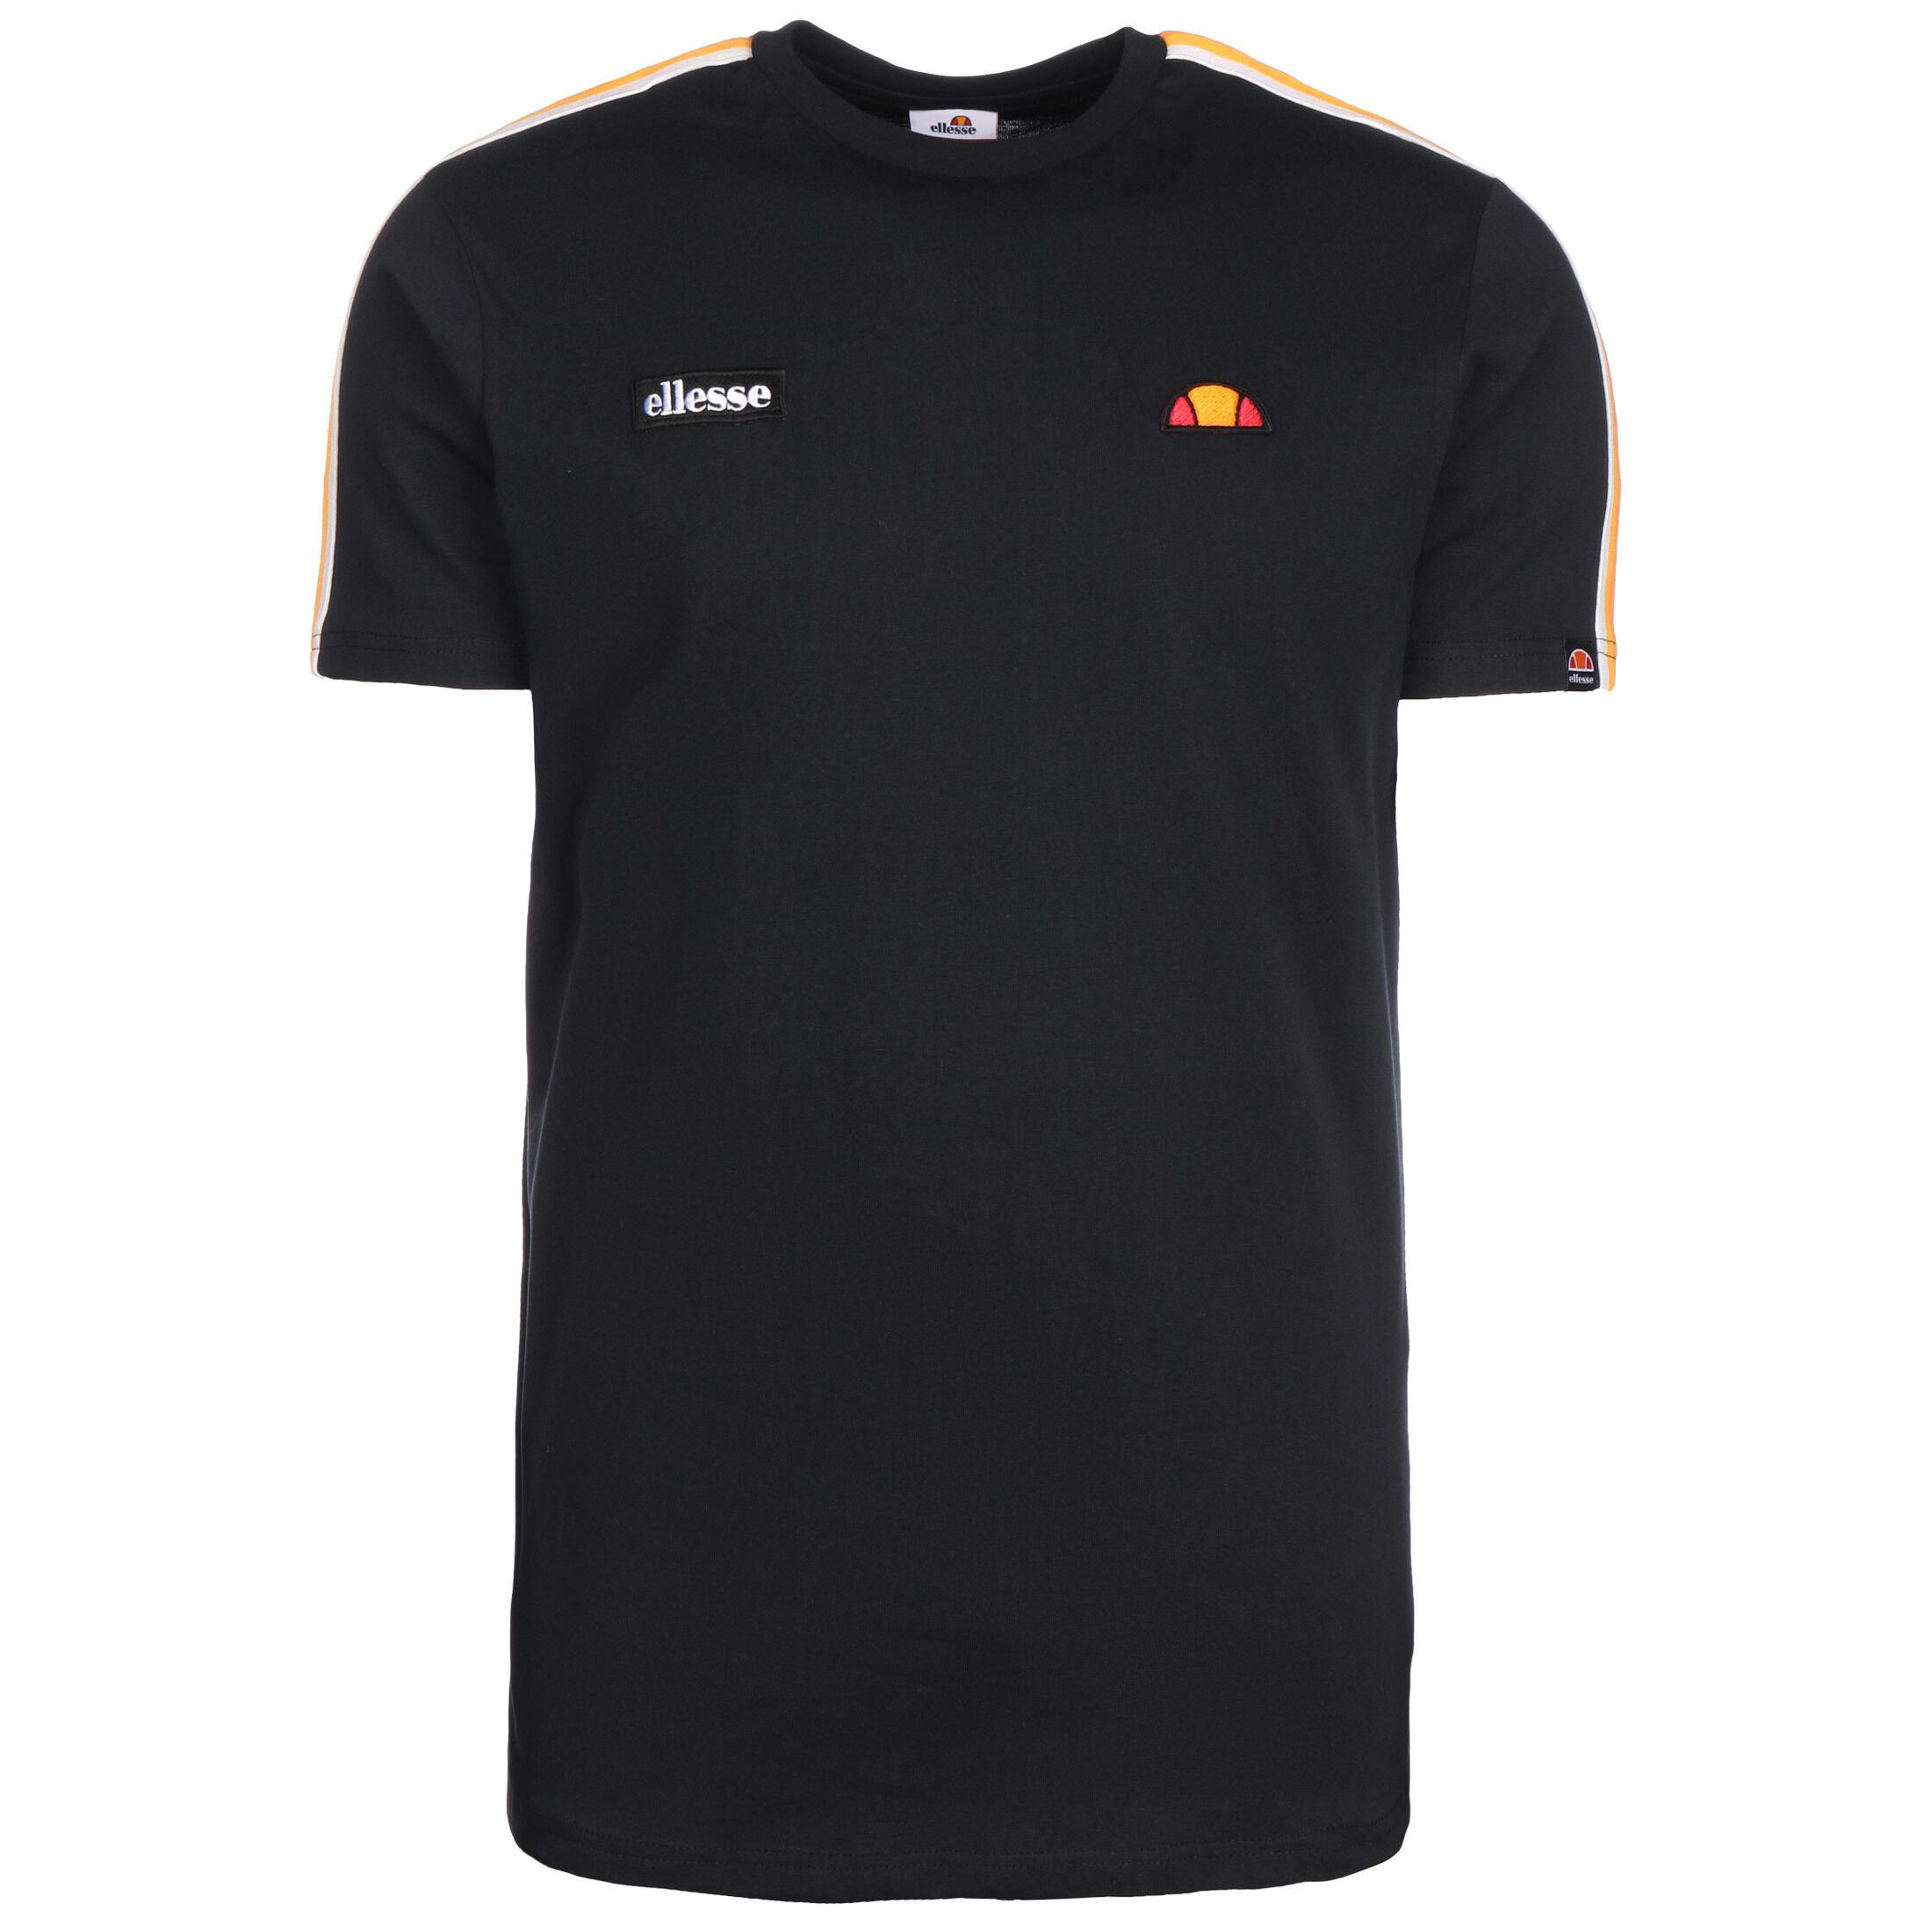 ellesse Baleno Iseo T Shirt Herren bei OUTFITTER